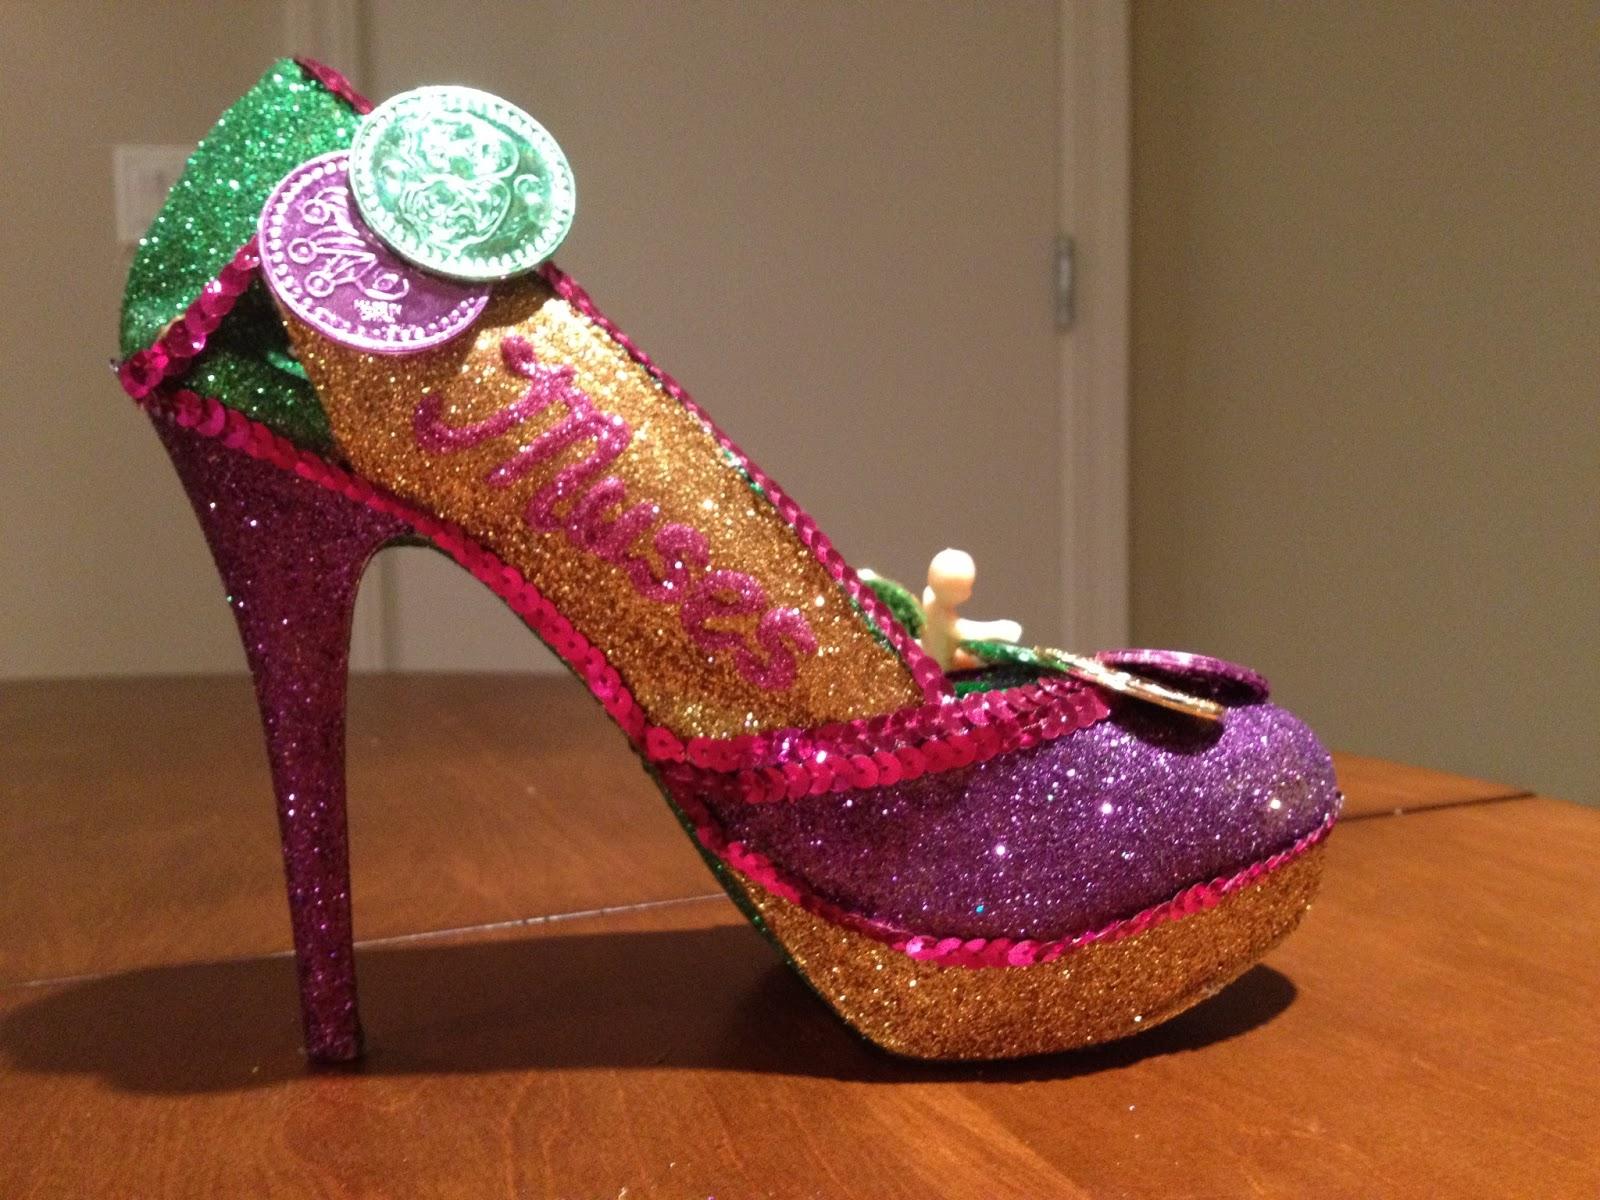 The Mardi Gras Doubloon Shoe